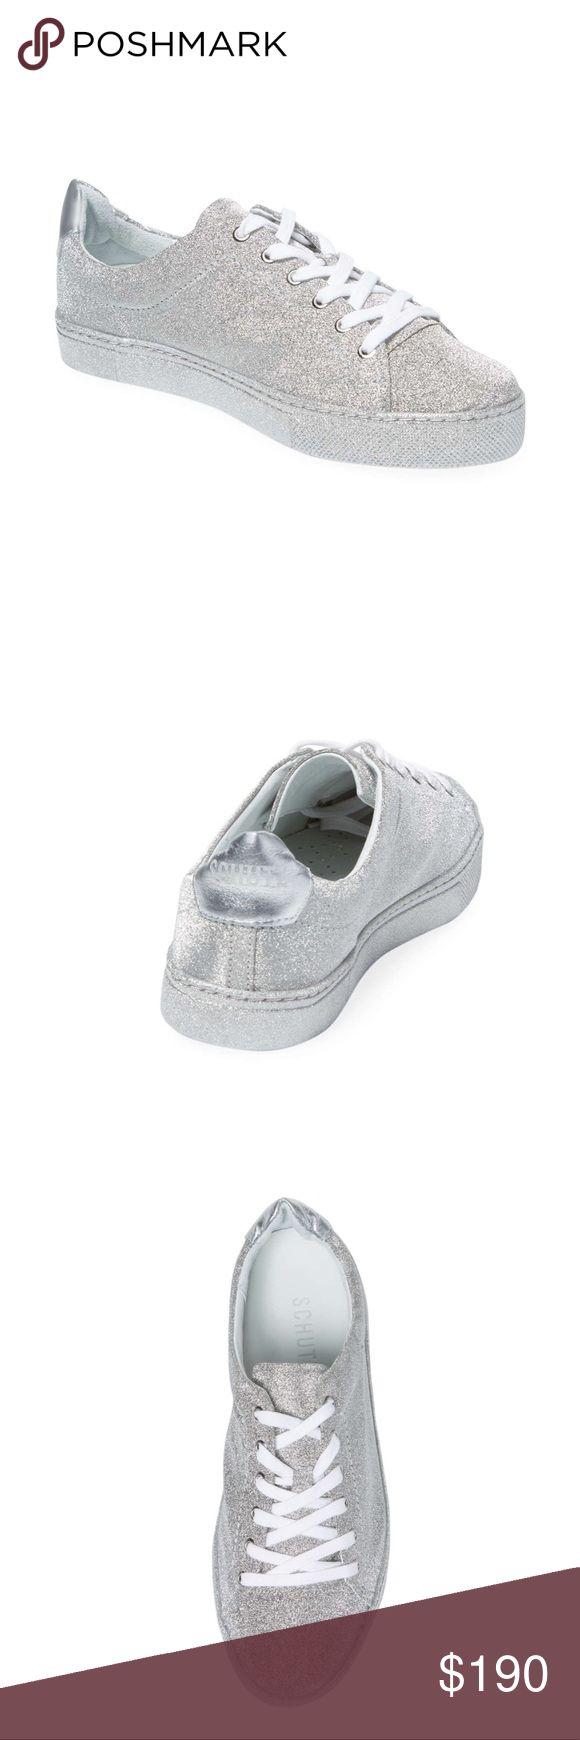 Schutz Chayton leather low top sneakers Schutz Chayton leather low top sneakers in silver. Women's 8. Worn twice, in almost-perfect condition. SCHUTZ Shoes Sneakers